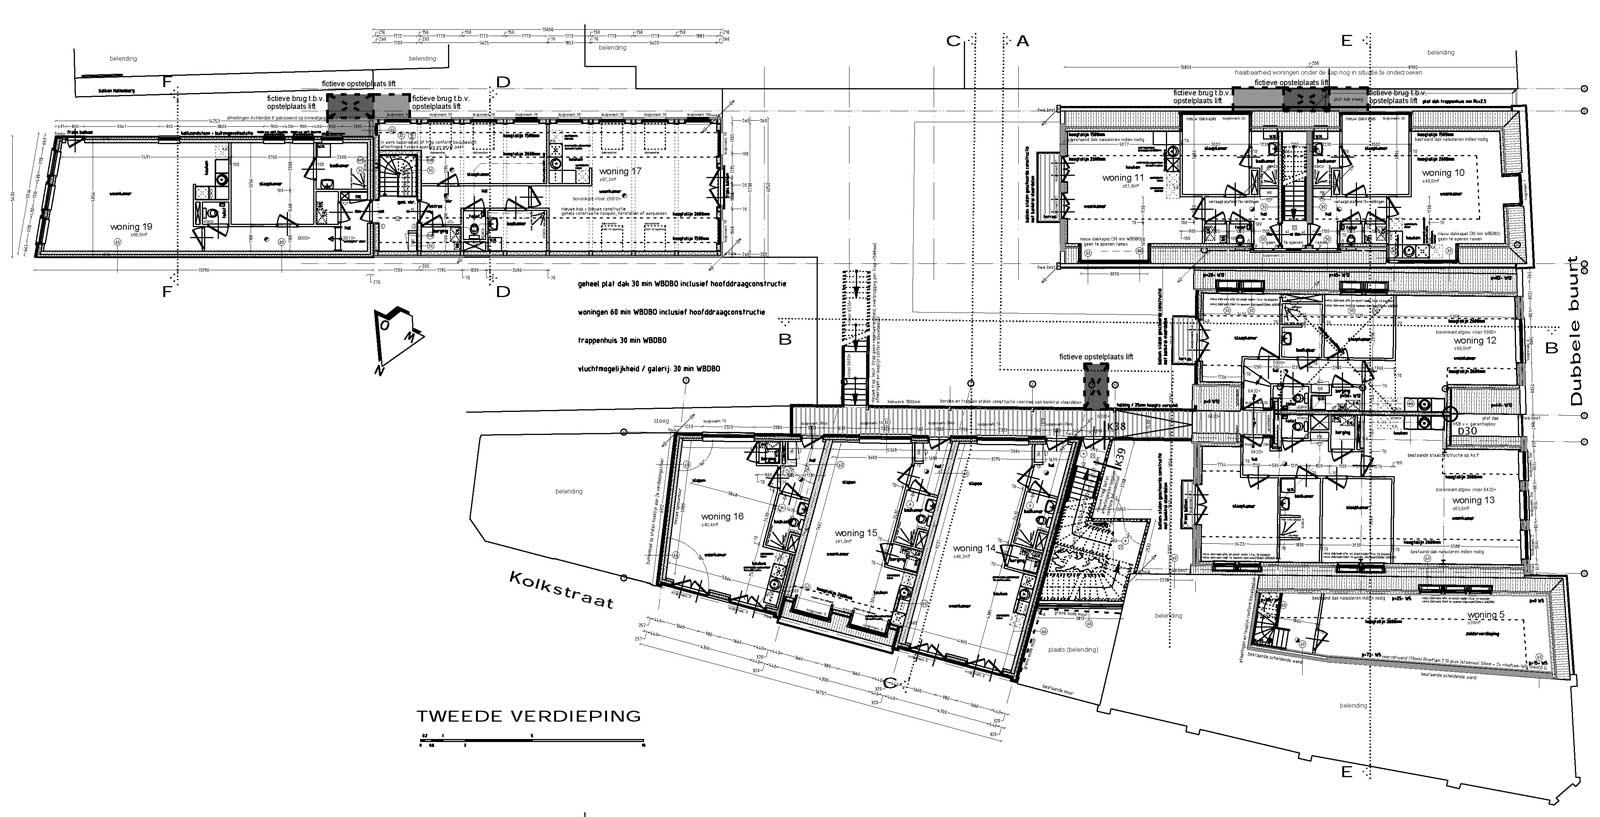 tweede verdieping - Binnenstedelijke herontwikkeling Dubbele Buurt Purmerend